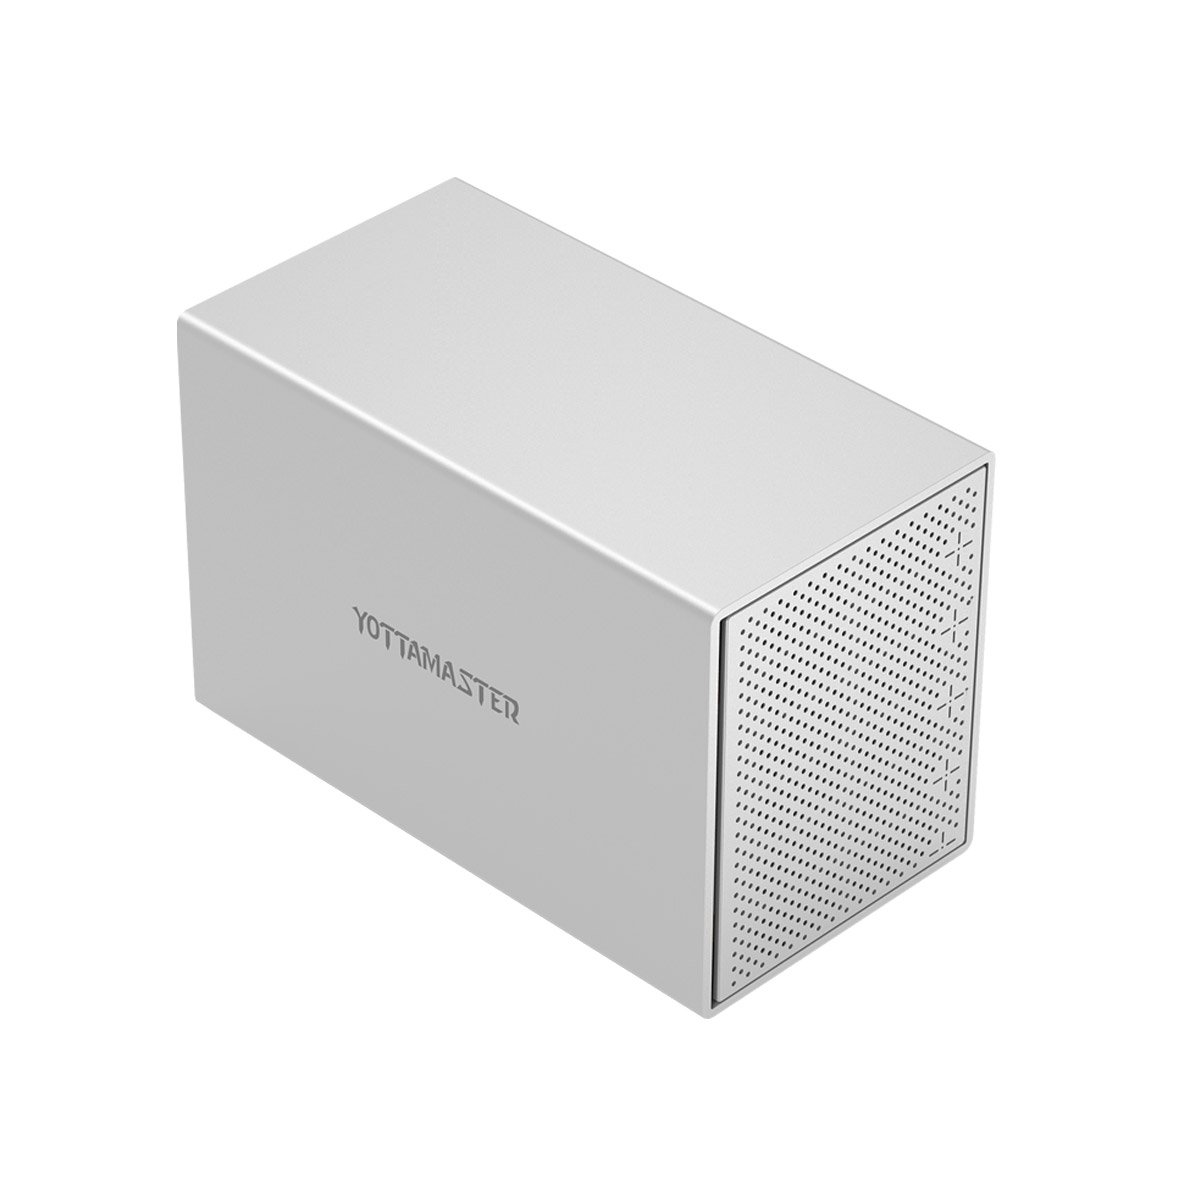 Yottamaster Aluminum Alloy 5 Bay 3.5 Inch USB3.0 RAID External HDD Enclosure SATAIII Support 5 x 10TB & UASP -Silver